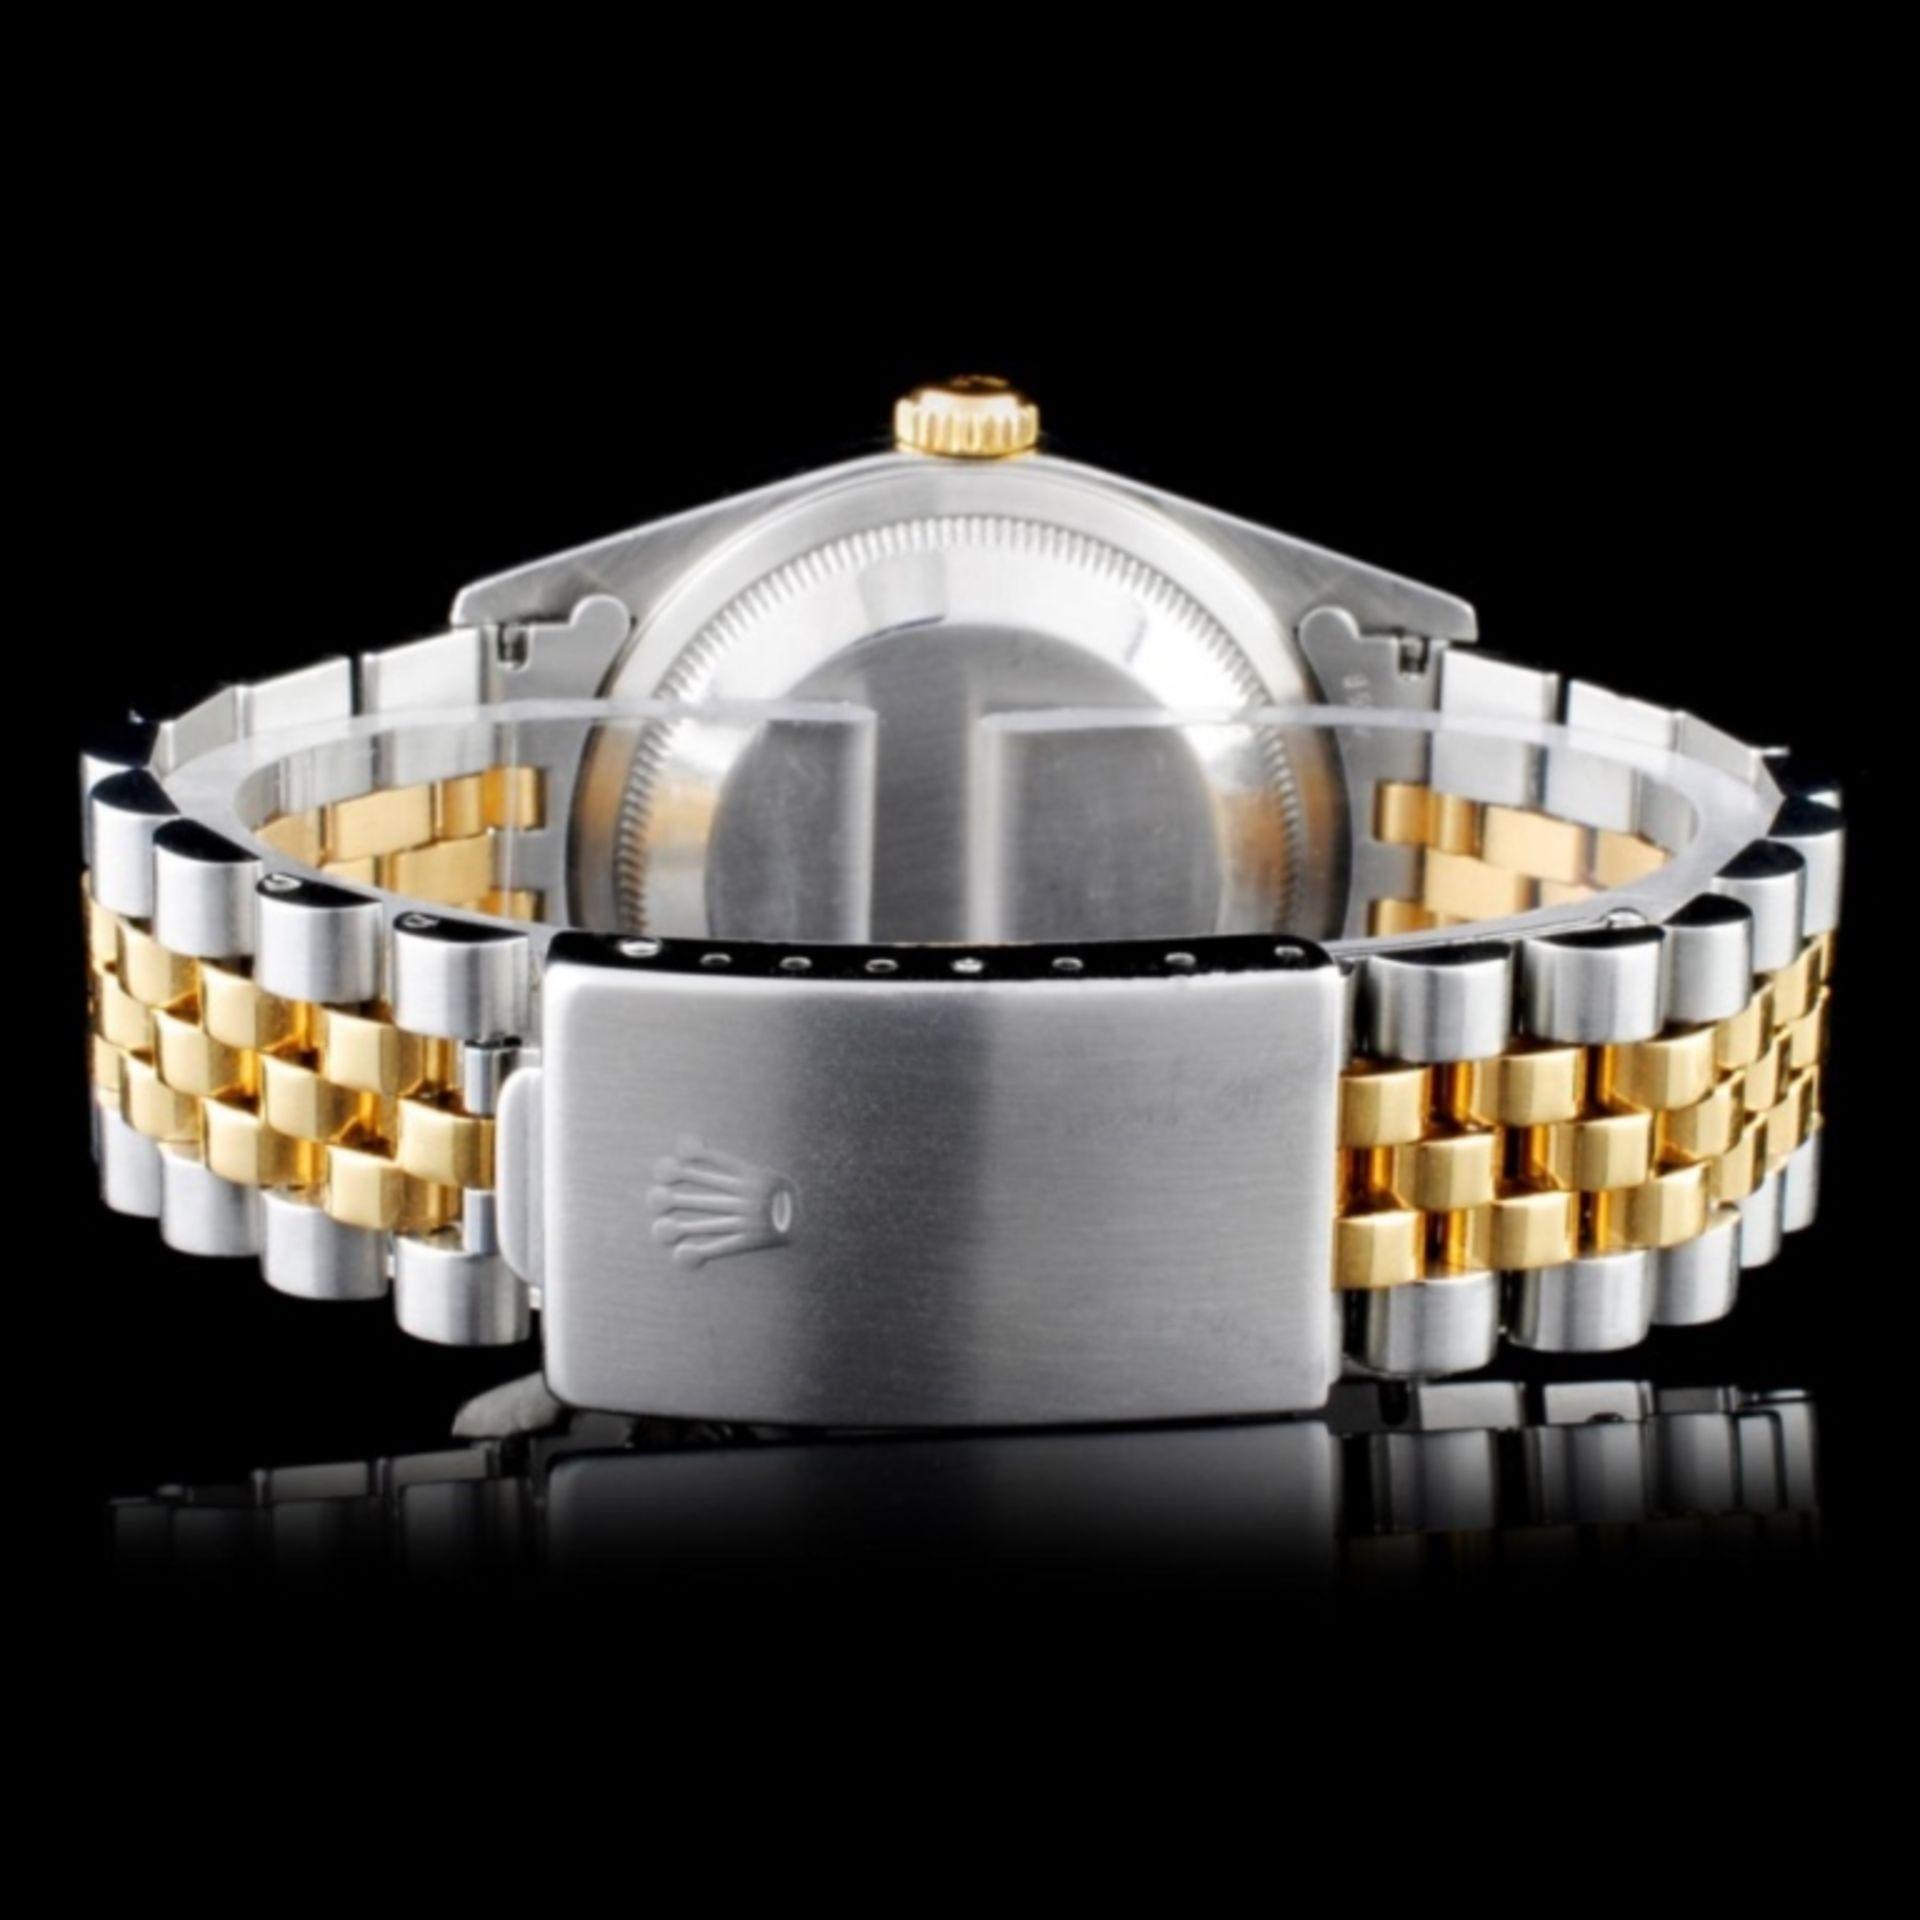 Rolex YG/SS DateJust Diam 36MM Wristwatch - Image 3 of 5